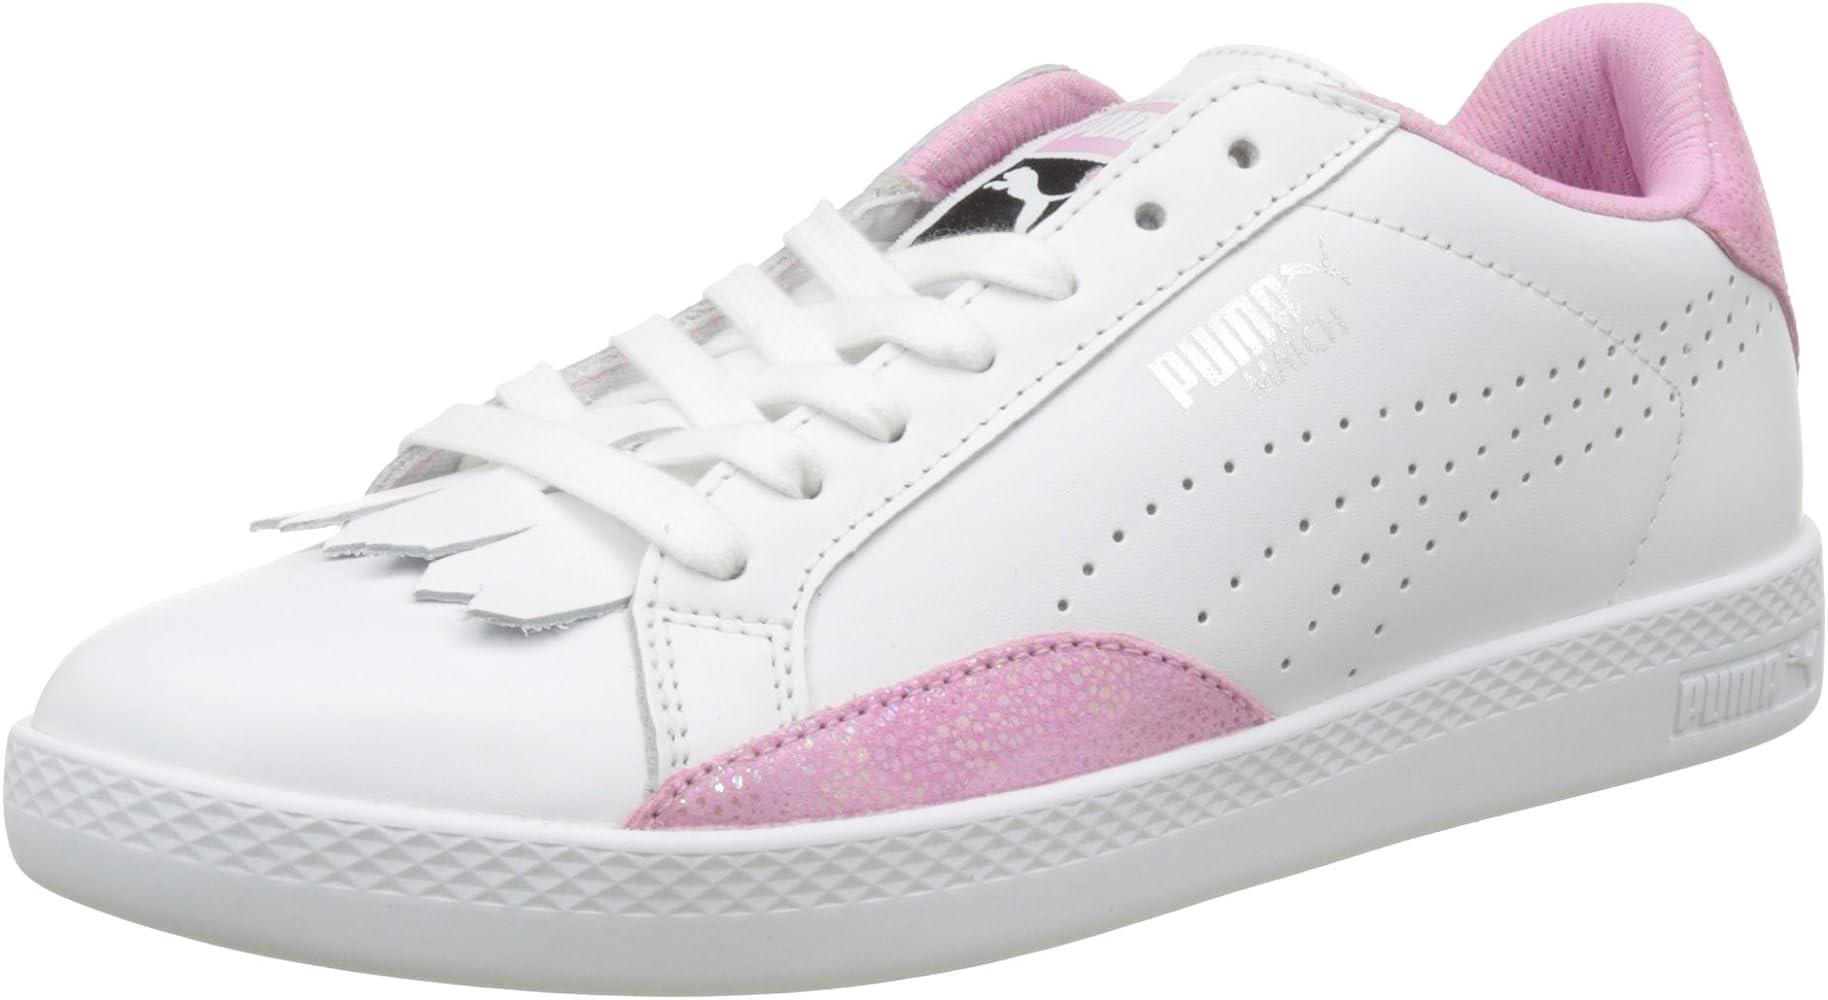 2017 Adulte Basket mode Sneakers PUMA Vikky Plat Blanc Blanc